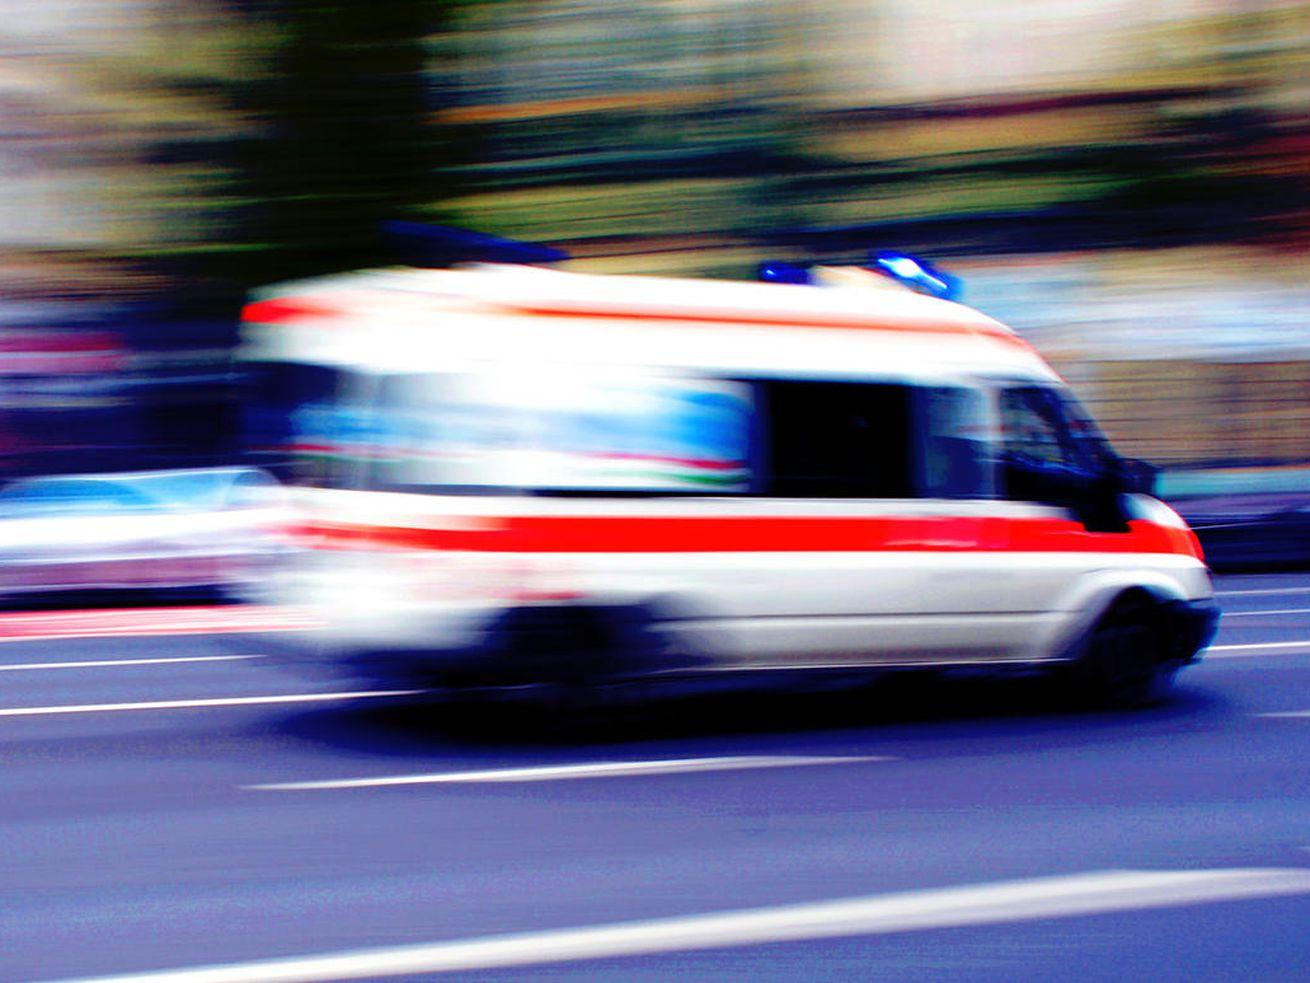 Utah motorcyclist killed in crash